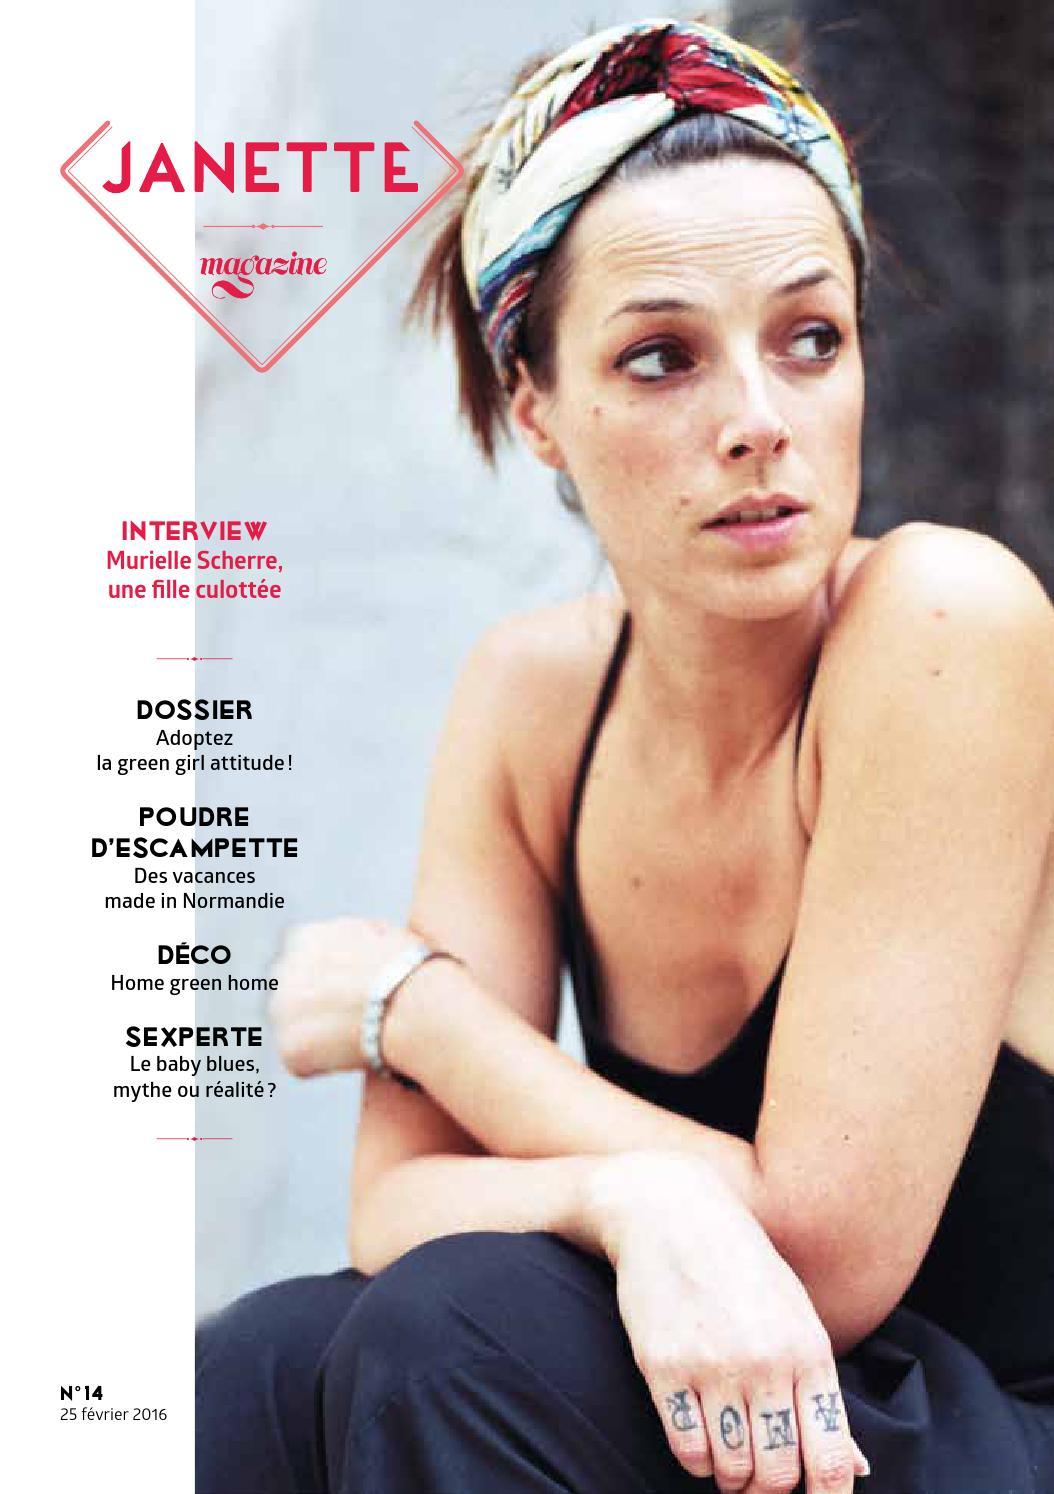 Janette14 - Mars 2016 by Janette Magazine